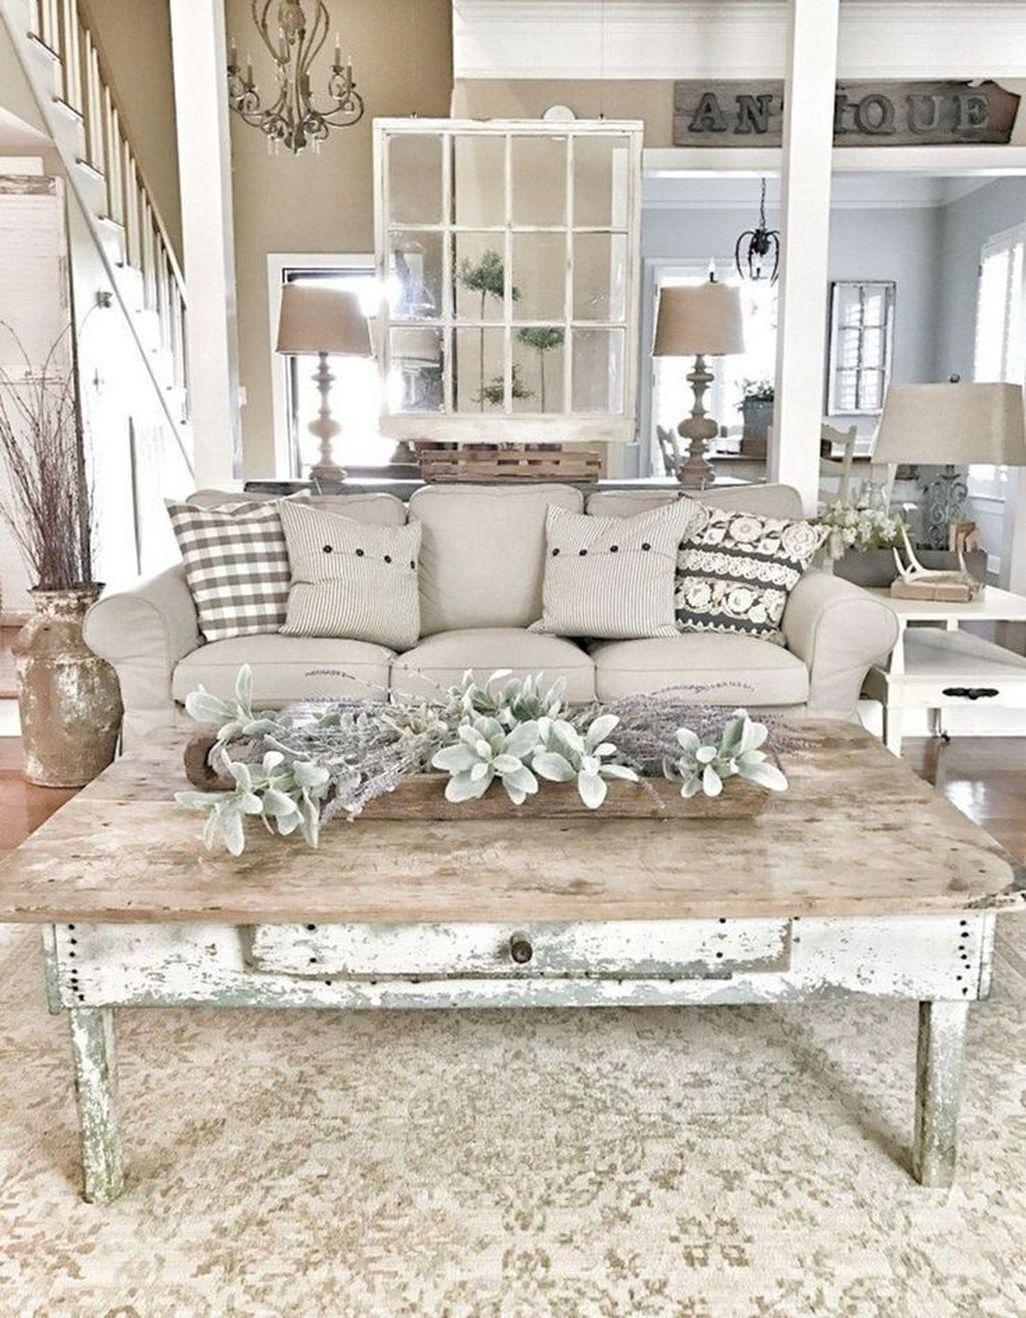 Farmhouse Home Decor Ideas 44